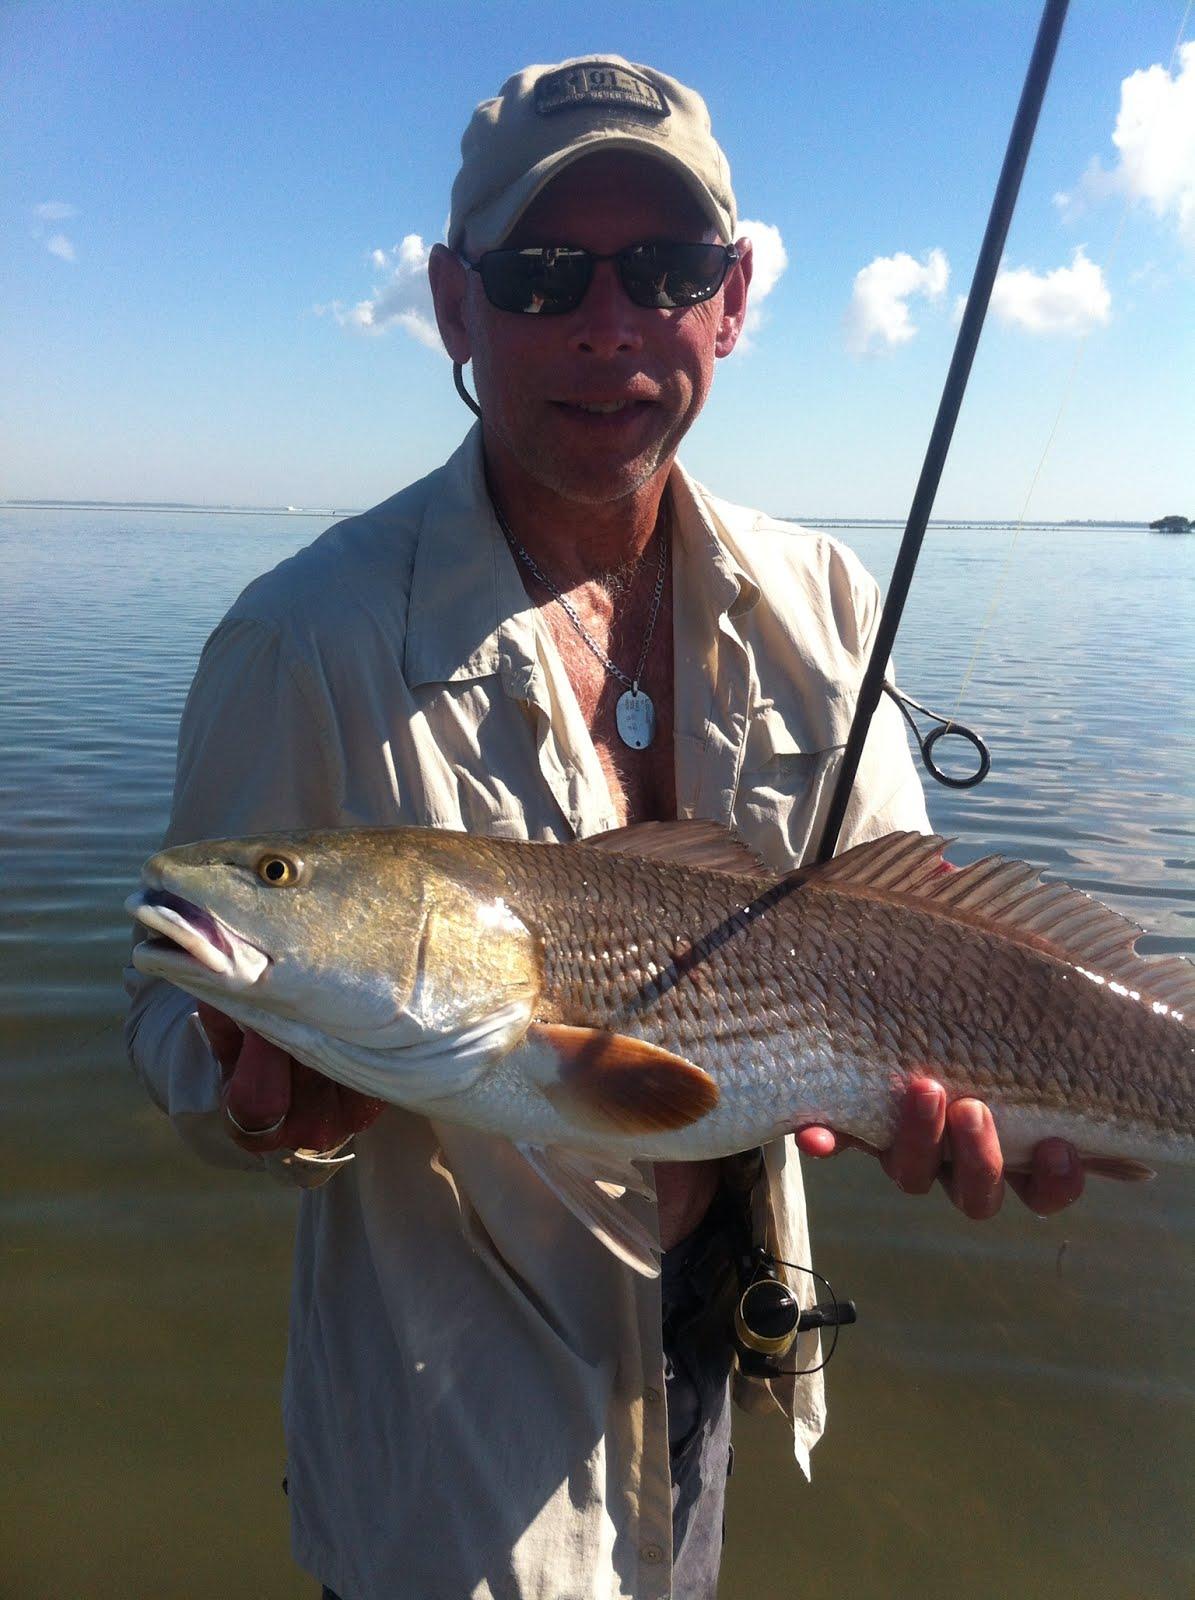 Fort myers and sanibel island fishing charter reports and for Pine island fishing charters